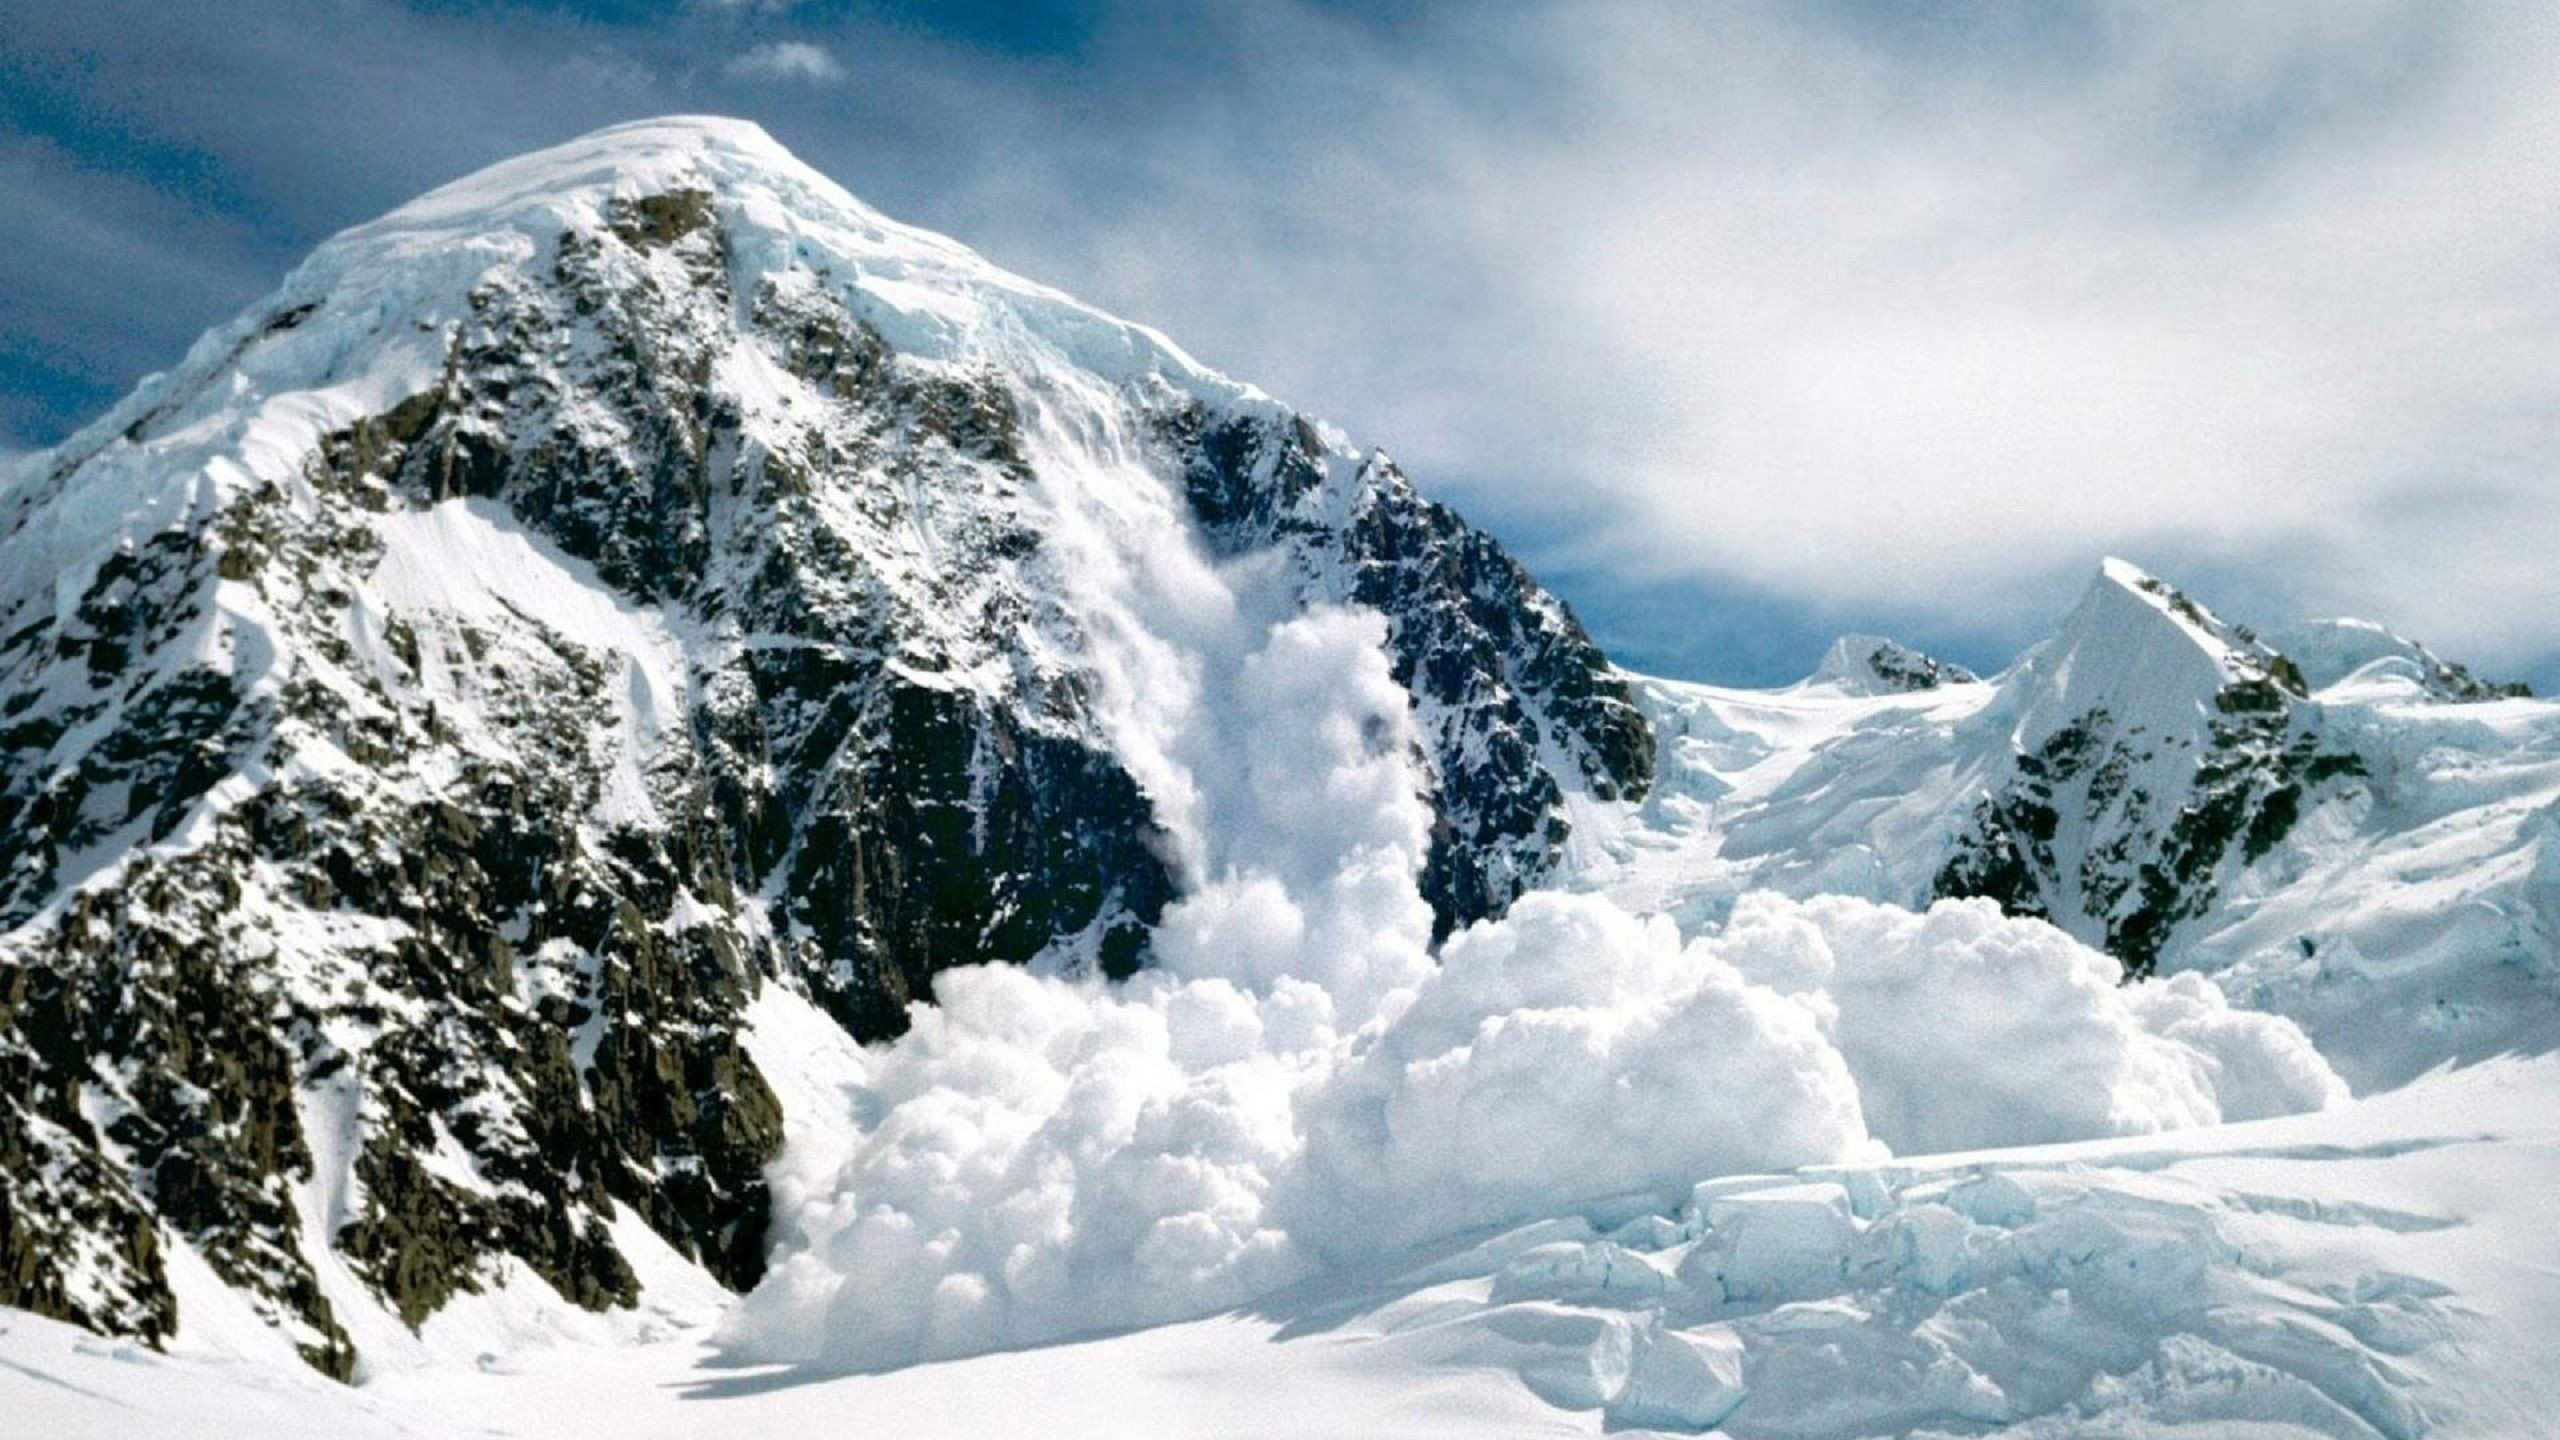 snow avalanche wallpaper for windows #jbt | earth | pinterest